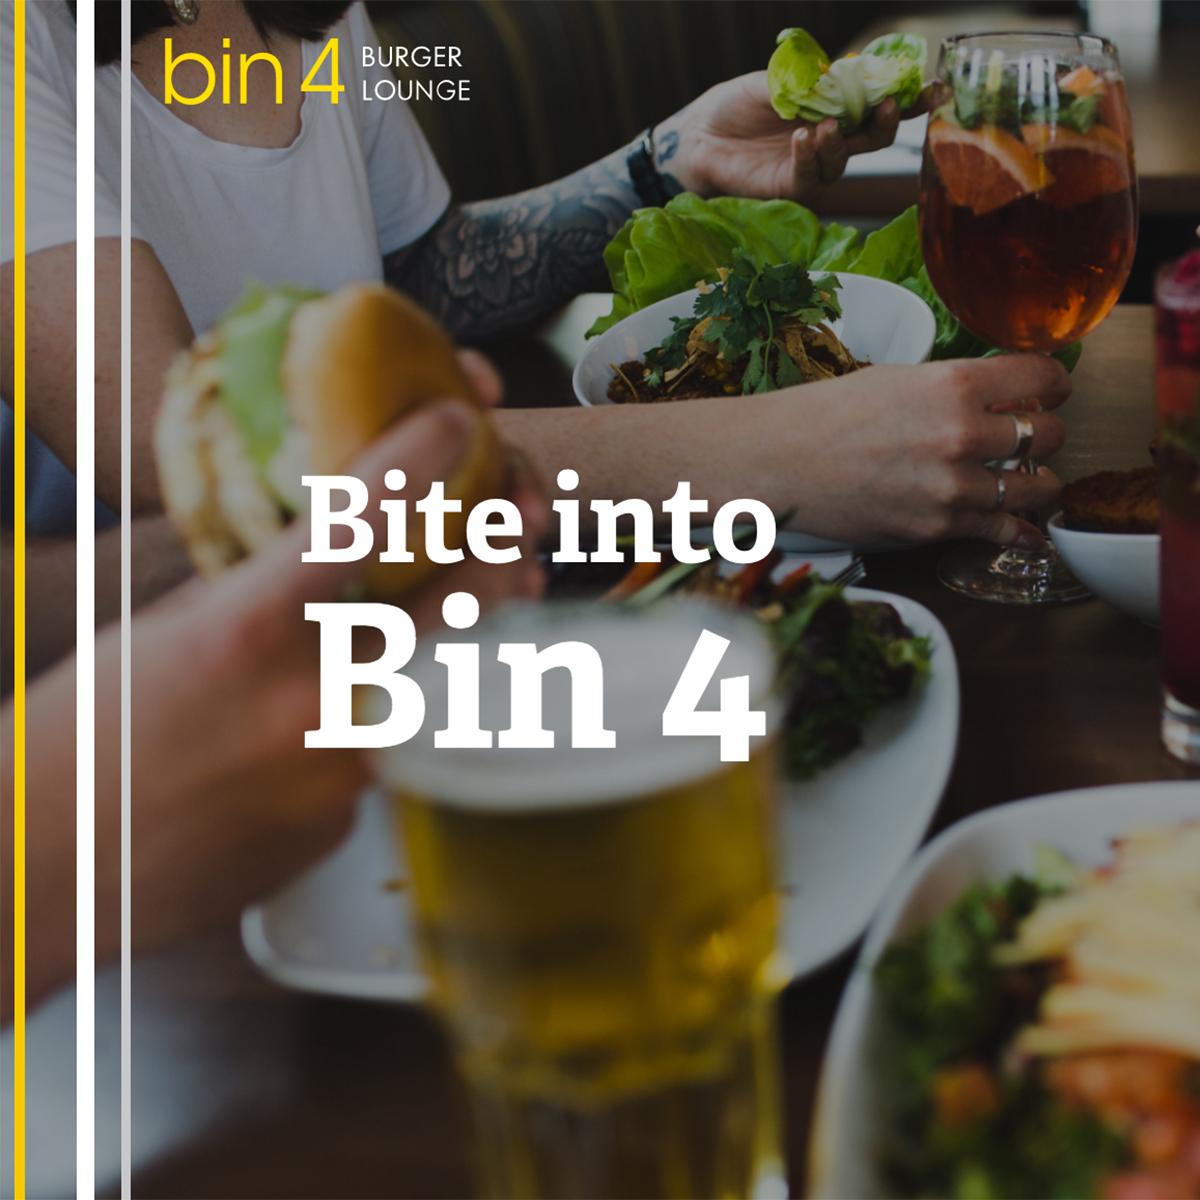 Bin 4 Burger Lounge – Rethink your burger